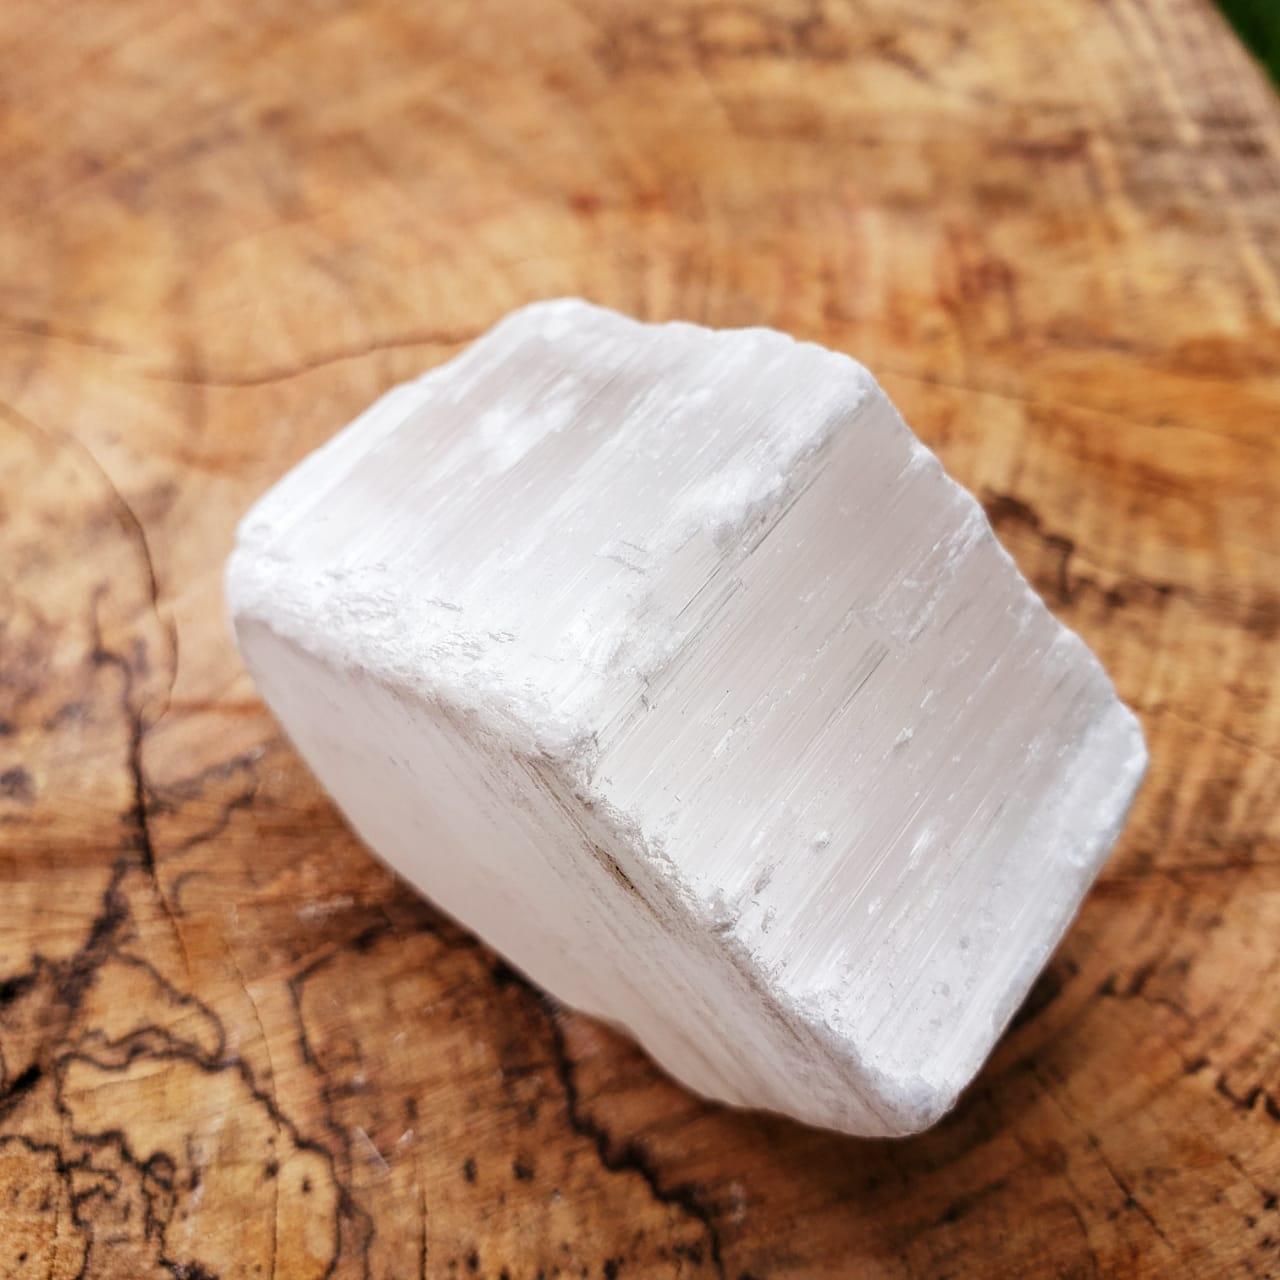 Cristal - Selenita Pedra Bruta (Unidade)